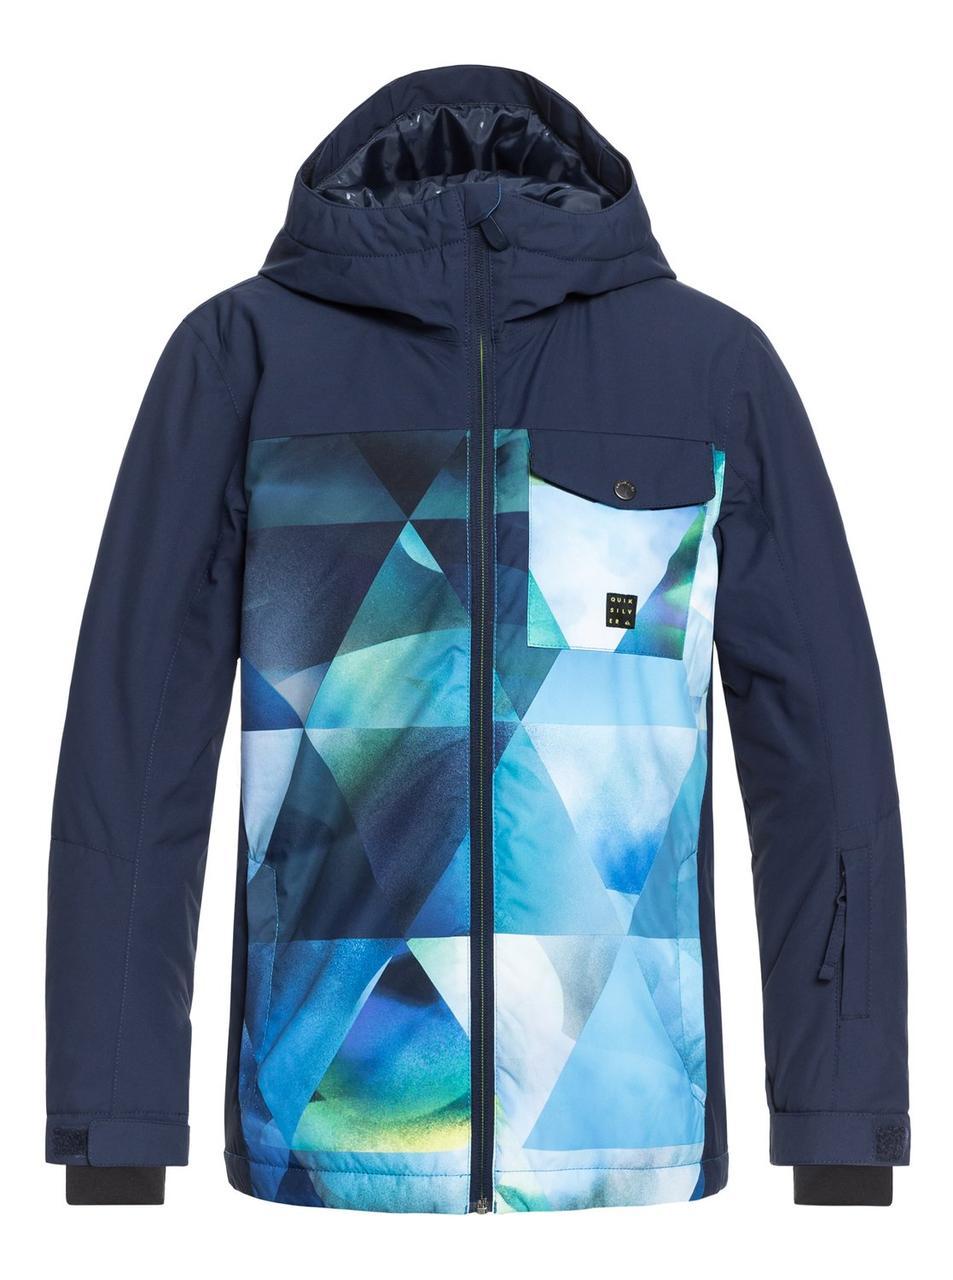 b58c80fc Сноубордическая куртка Quiksilver ( EQBTJ03080 ) MISS BLK YTH JK B SNJT 2019  - Интернет супермаркет